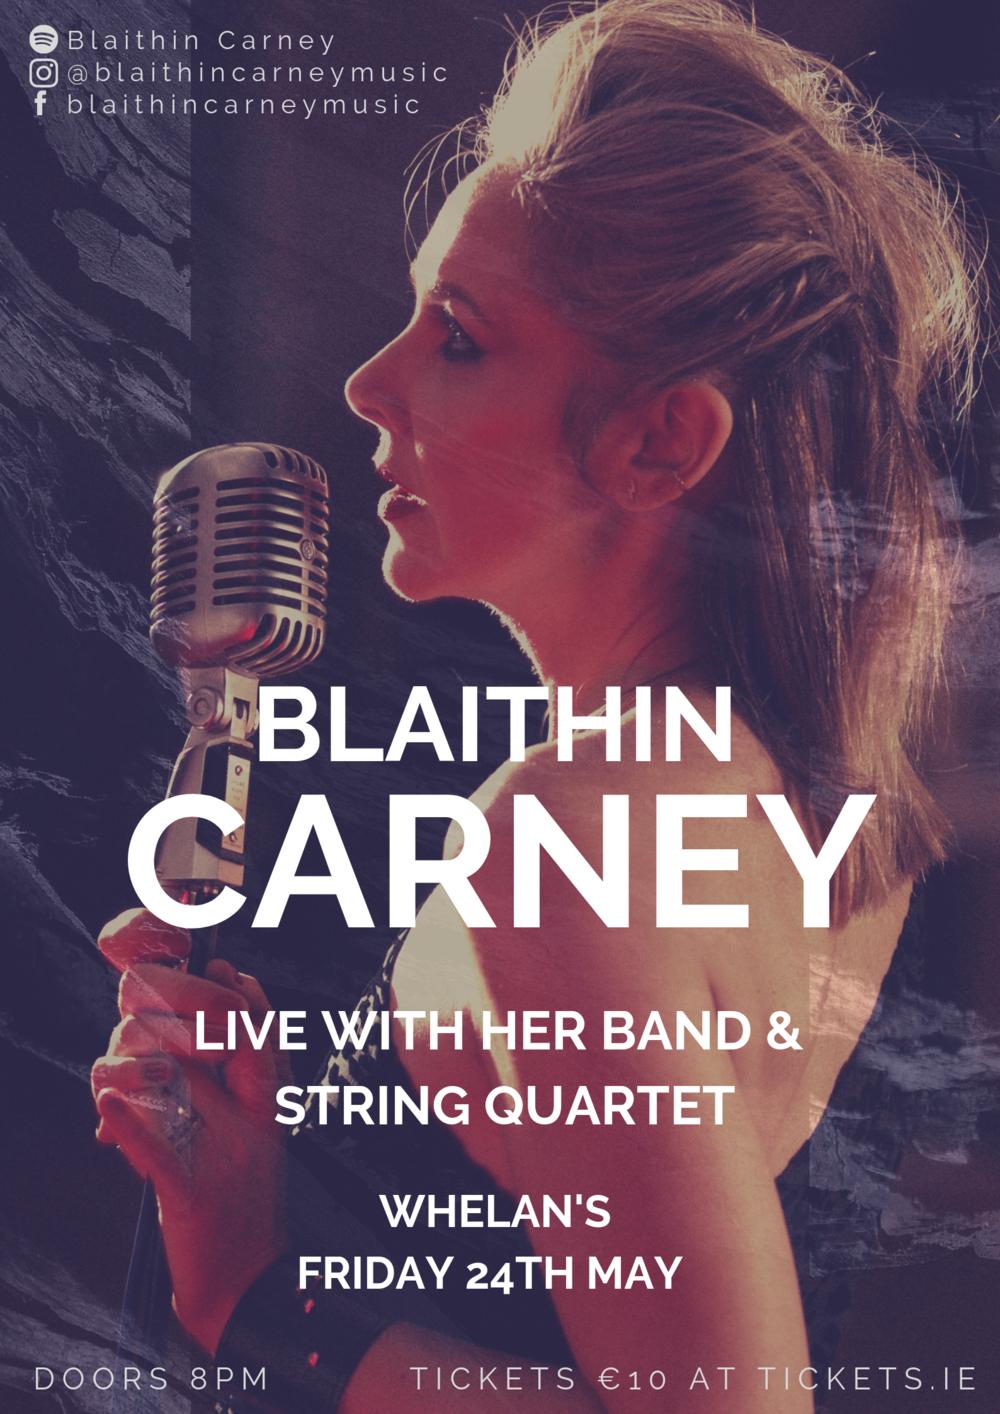 blaithin carney live at whelans poster